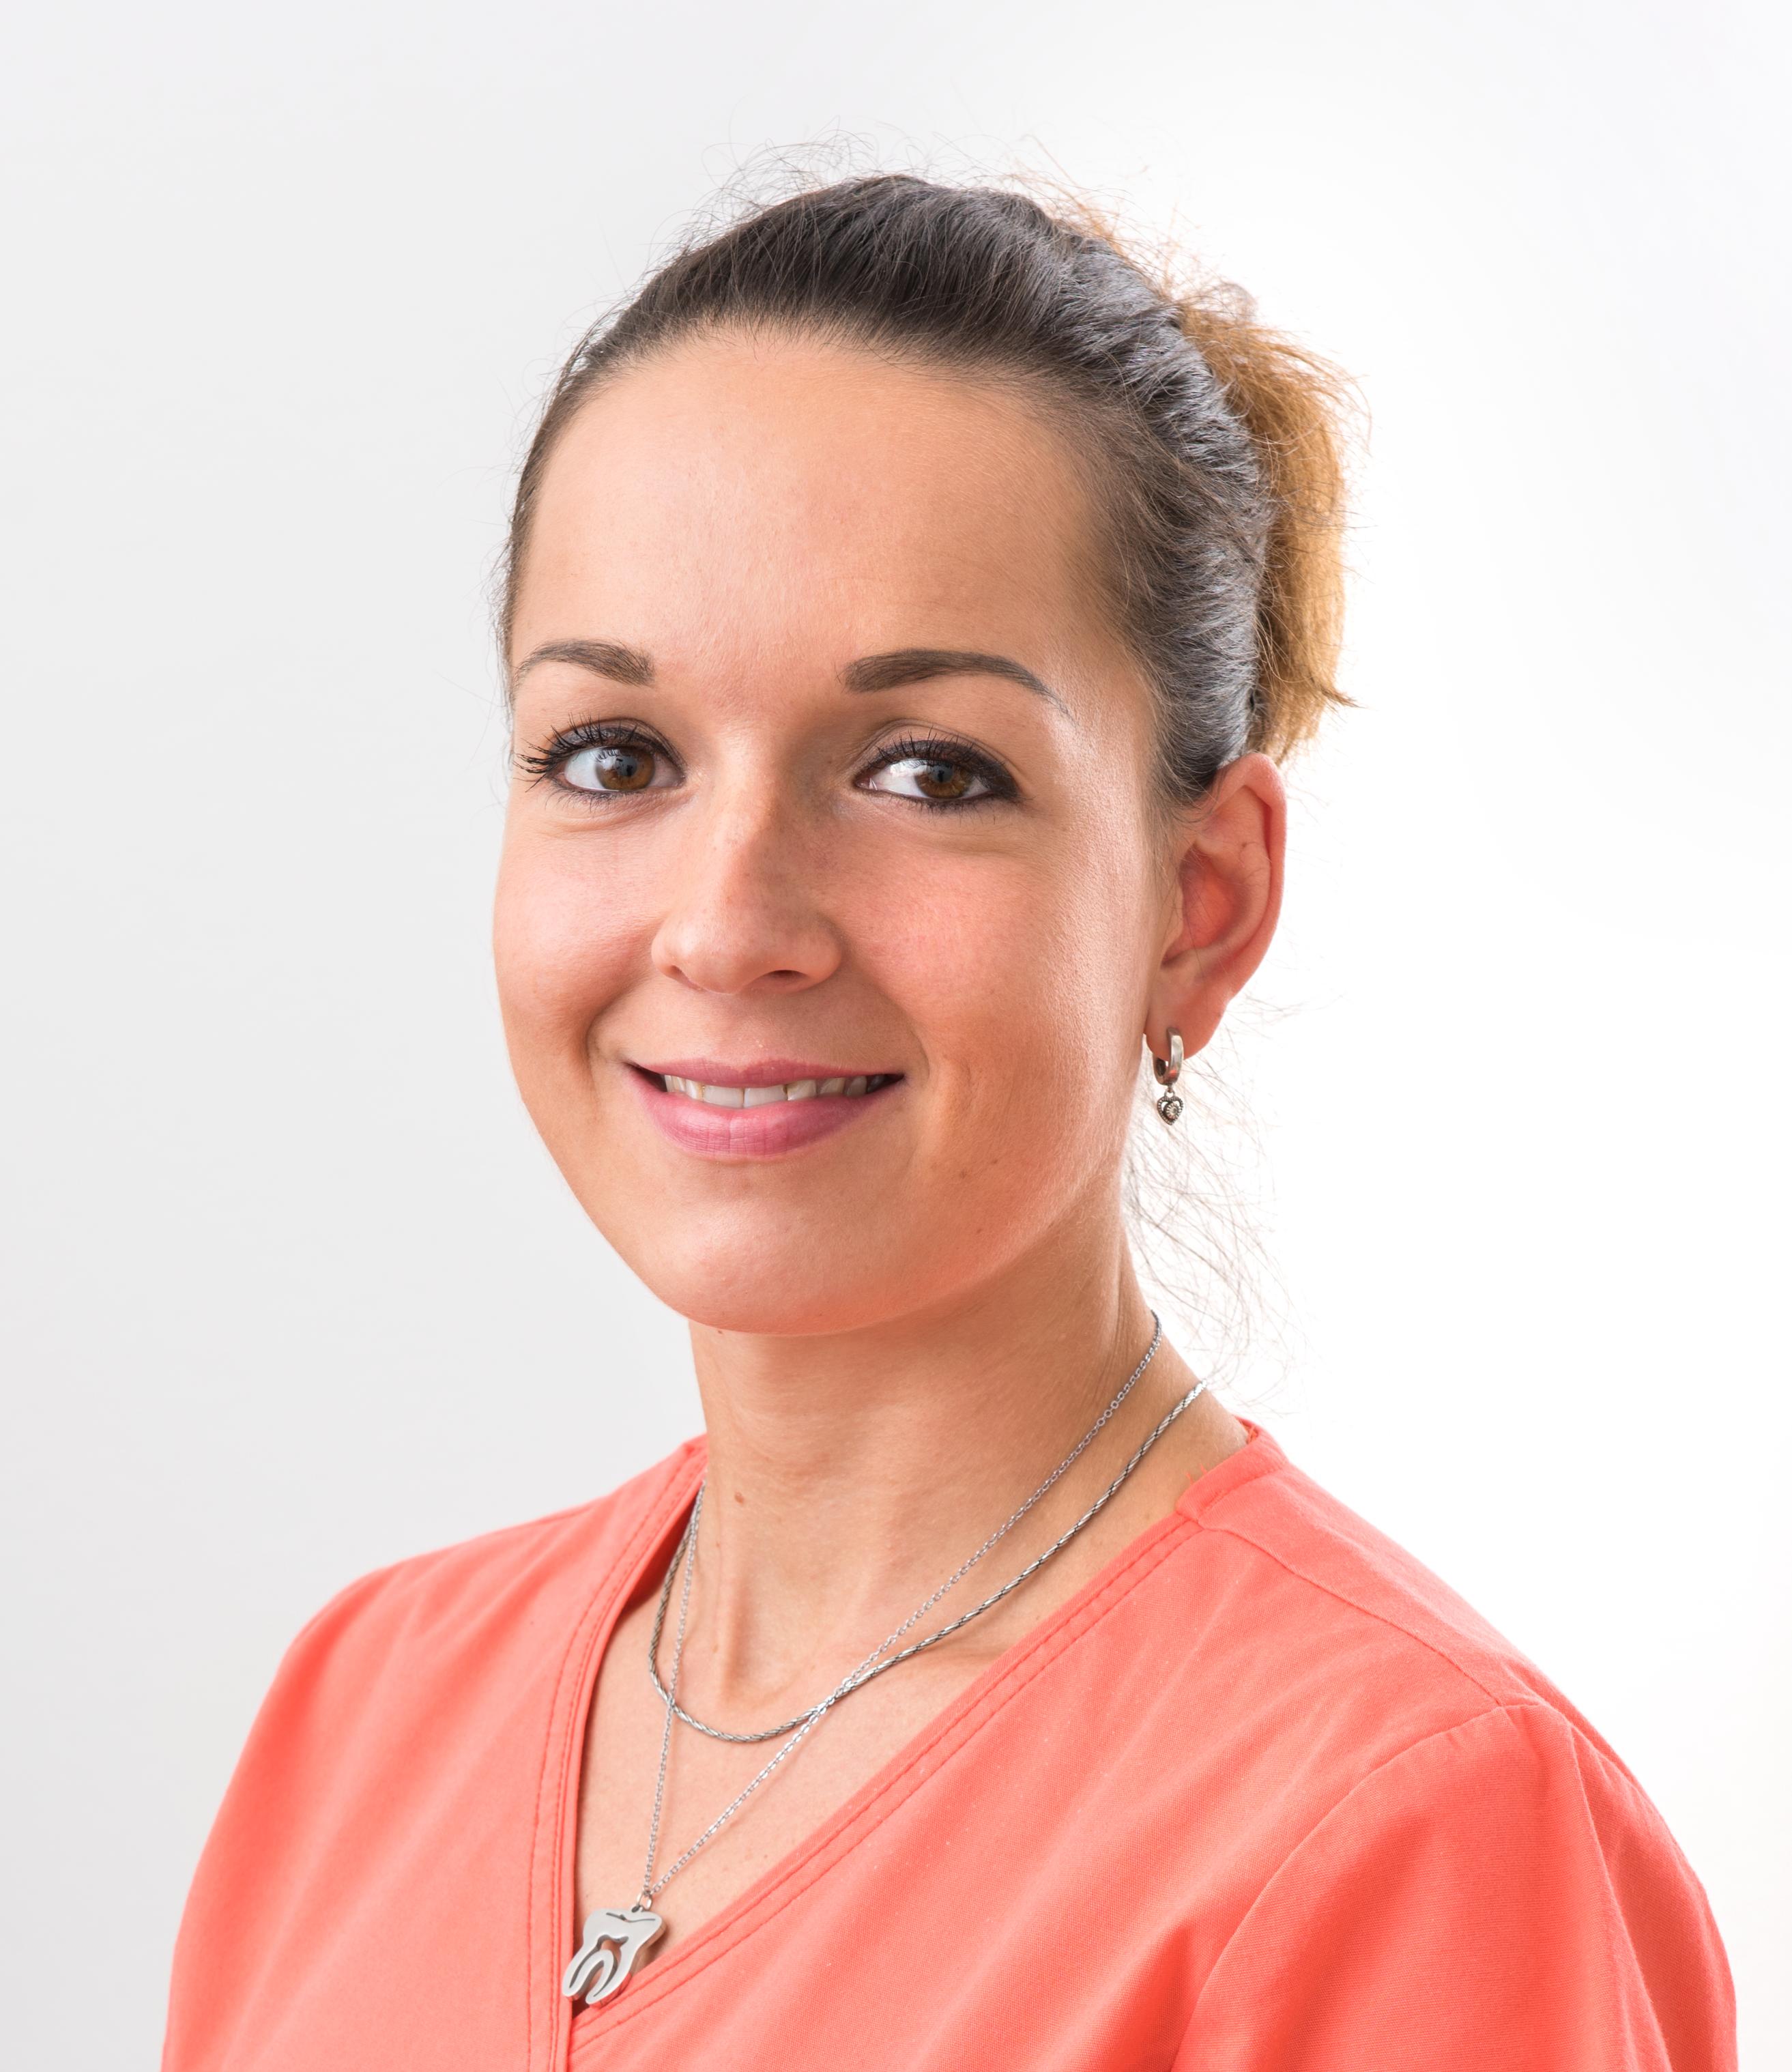 MDDr. Lenka Lojdová